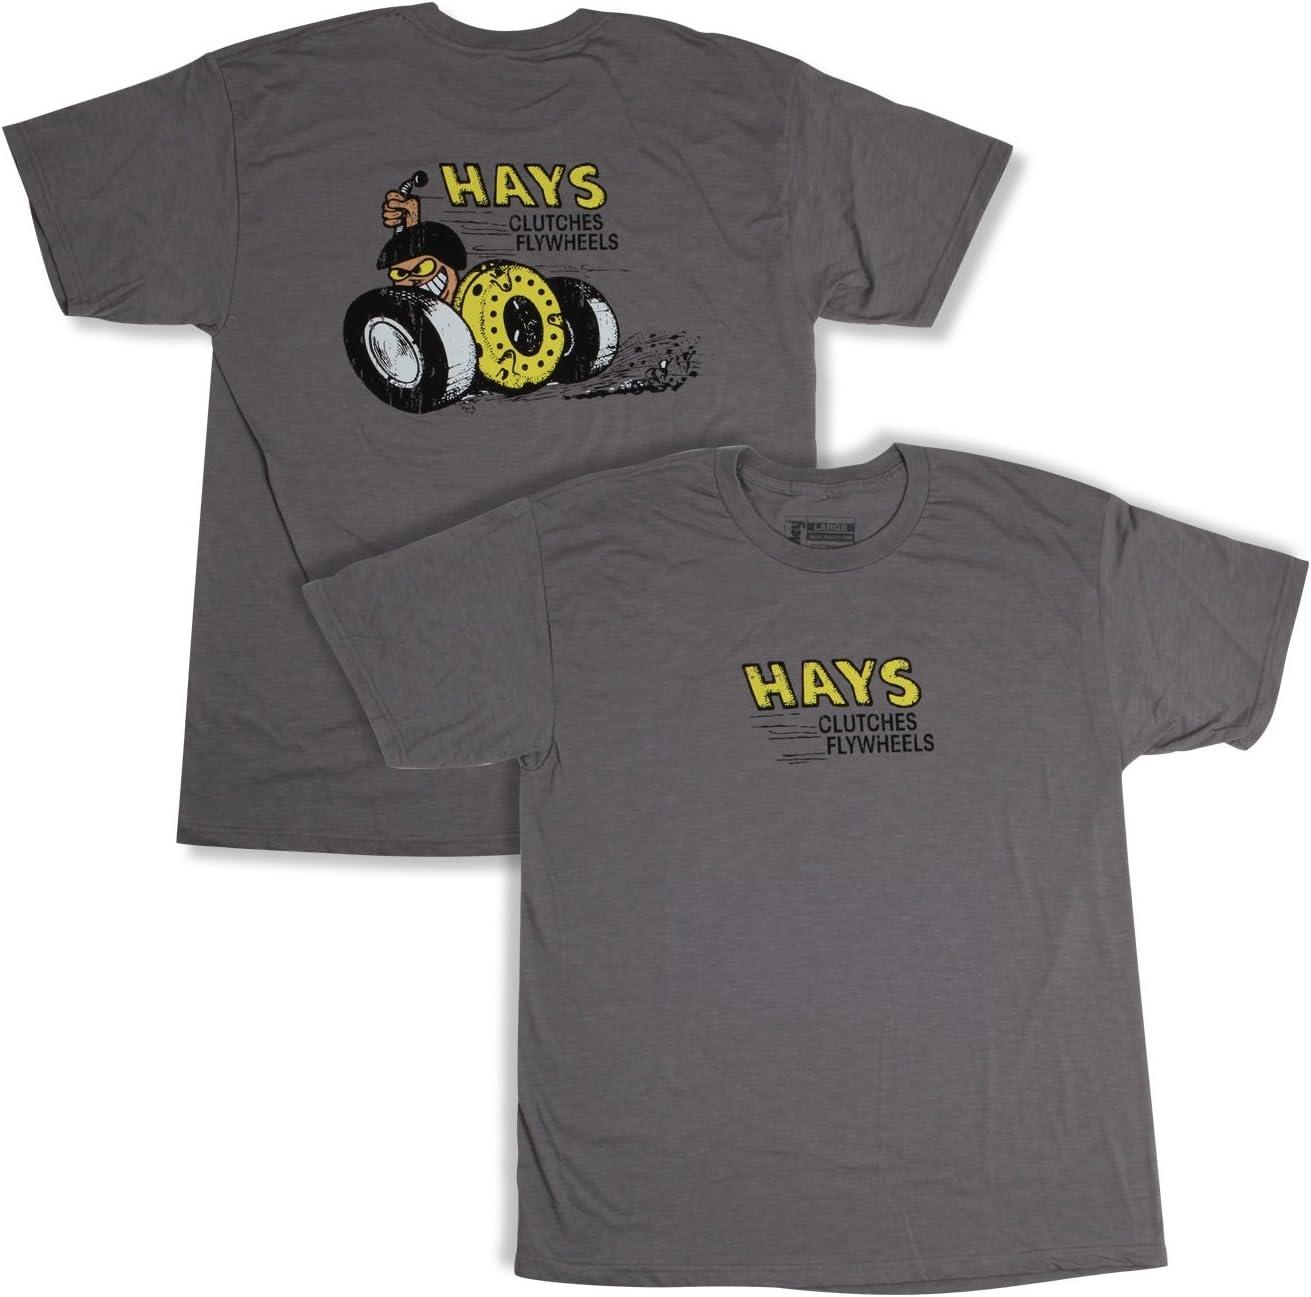 Hays 10065-LGHYS Gray Clutch Tee Large